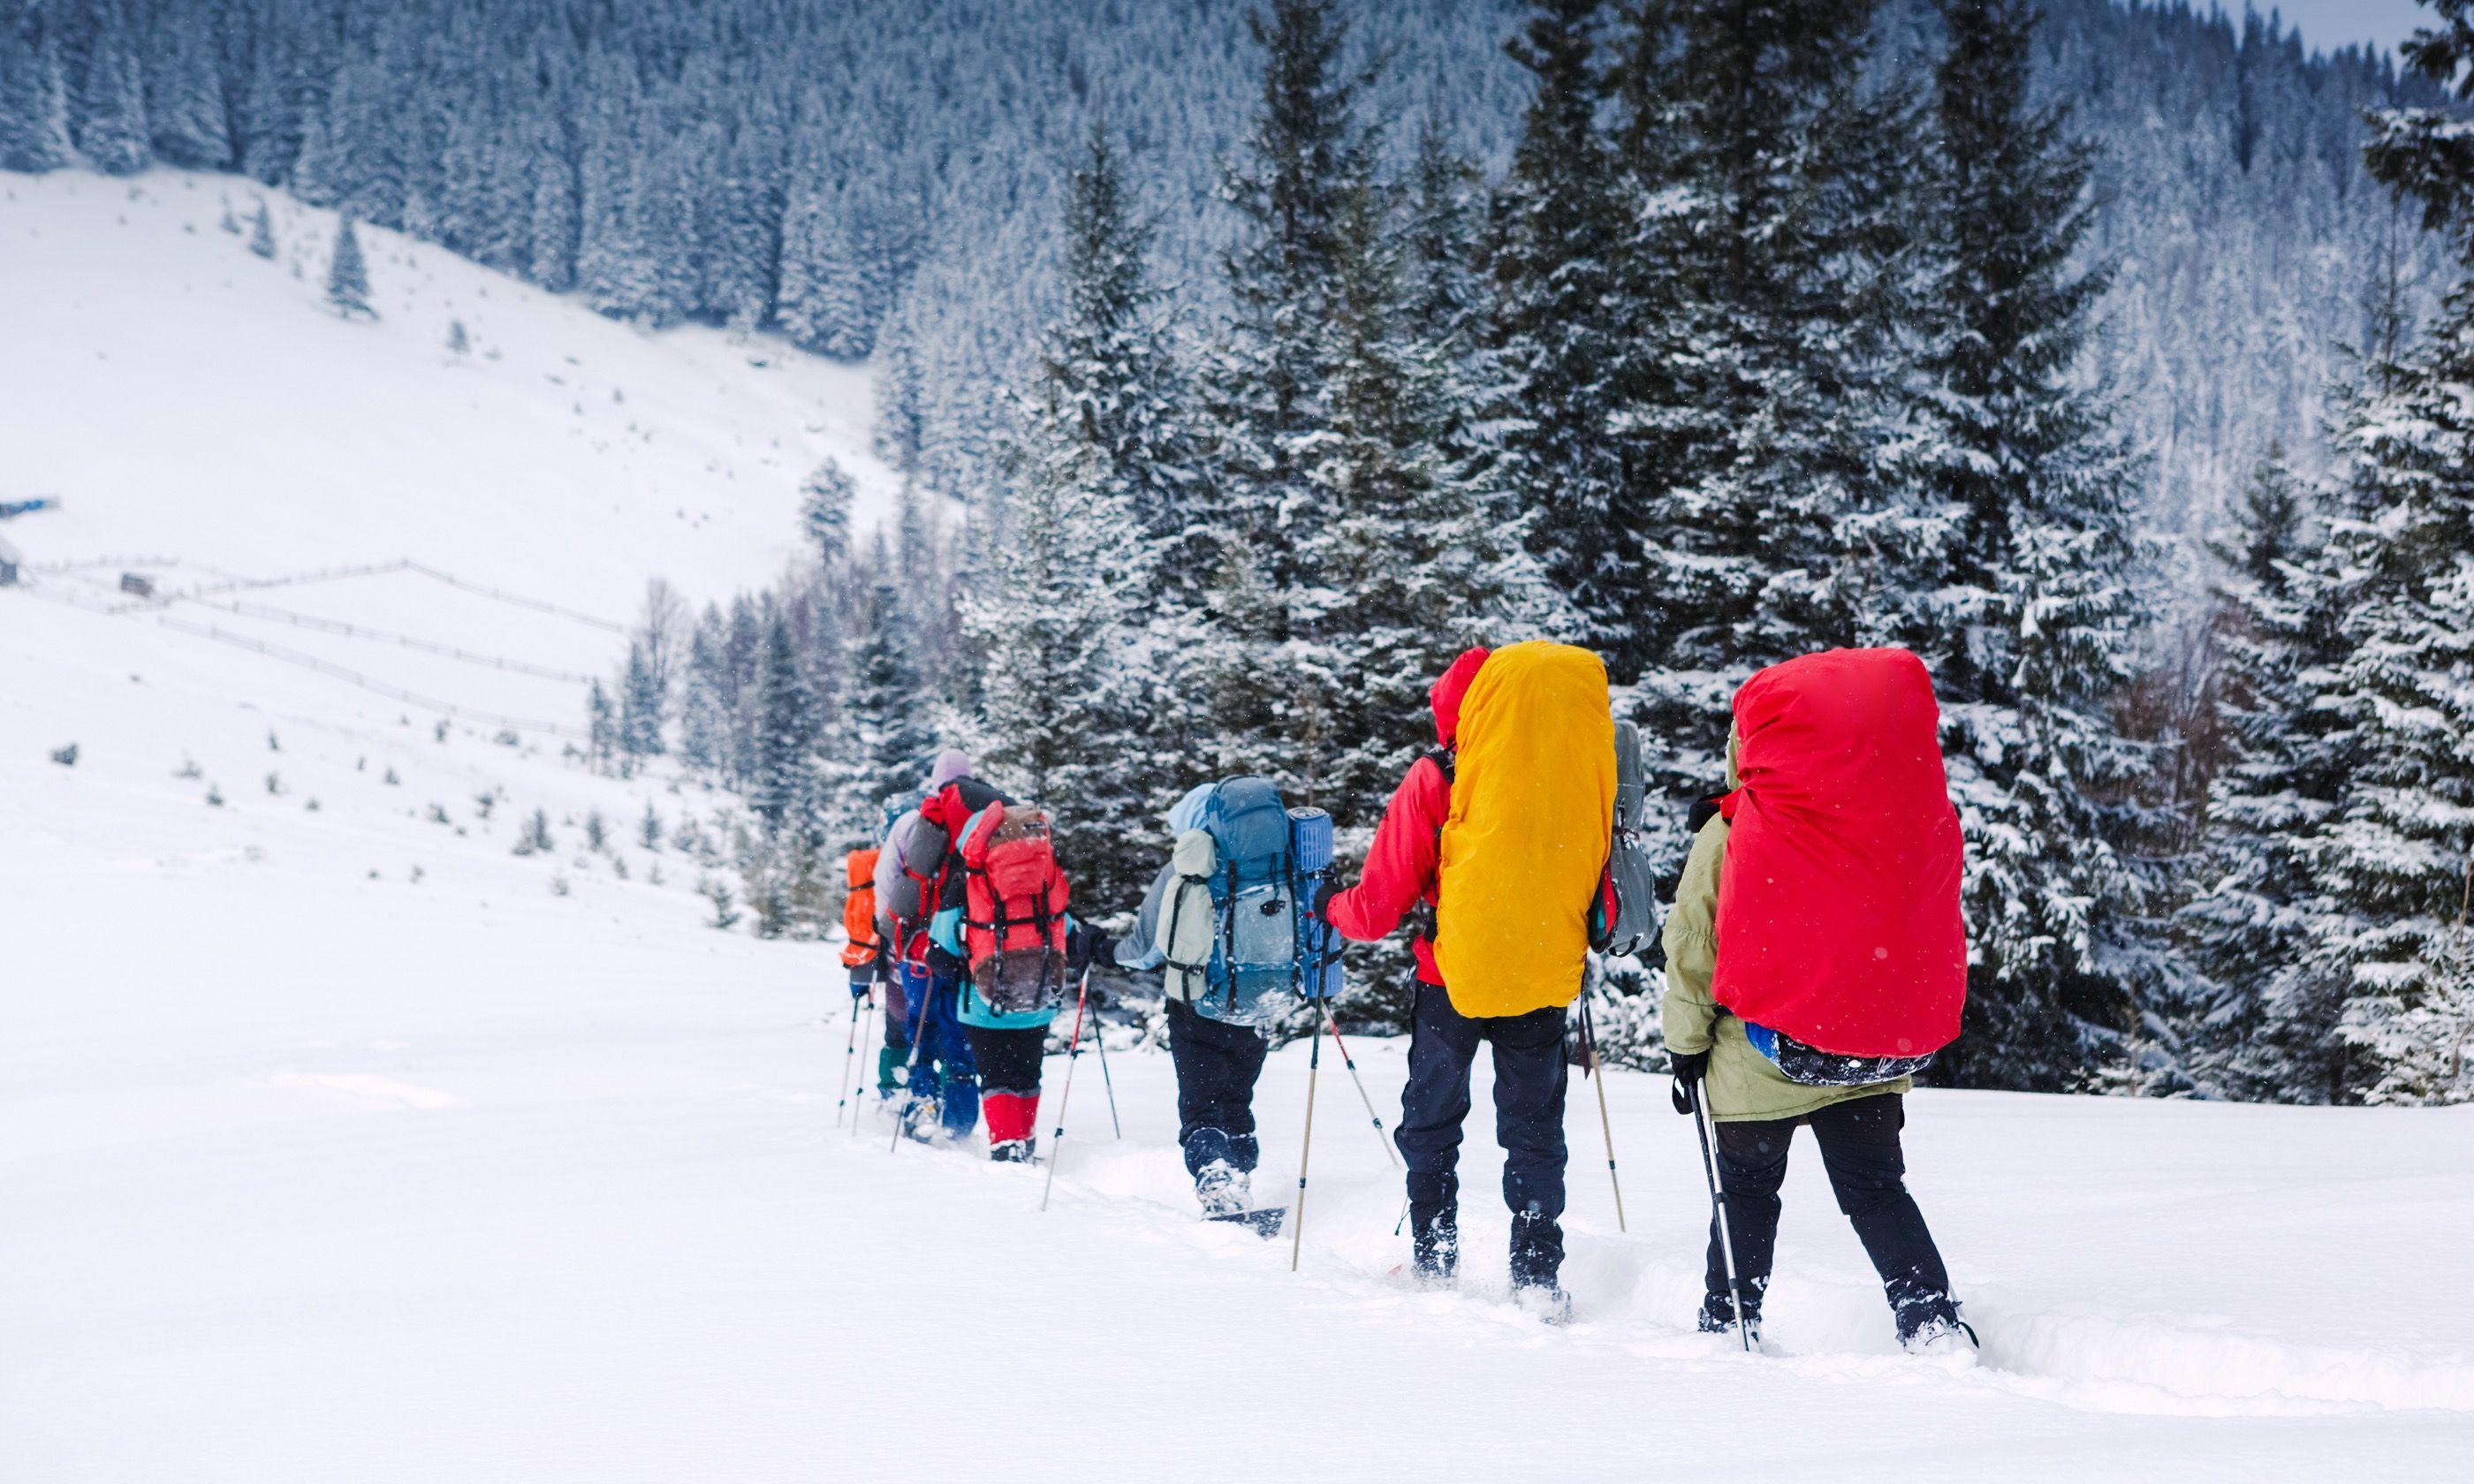 Snowshoeing (Shutterstock.com)